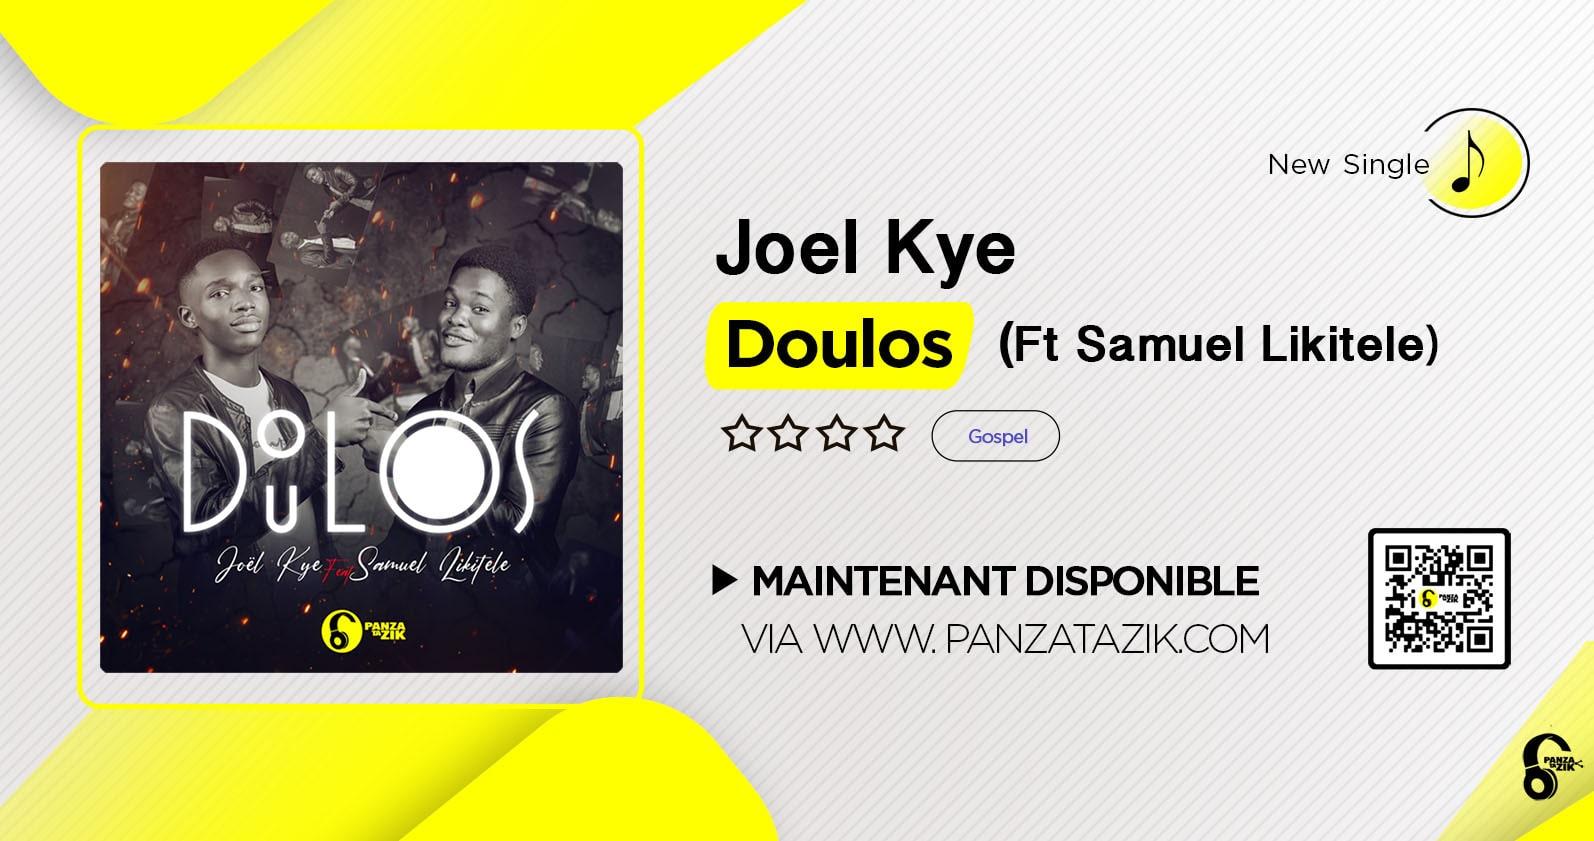 Joel Kye – Doulos (Ft. Samuel Likitele)